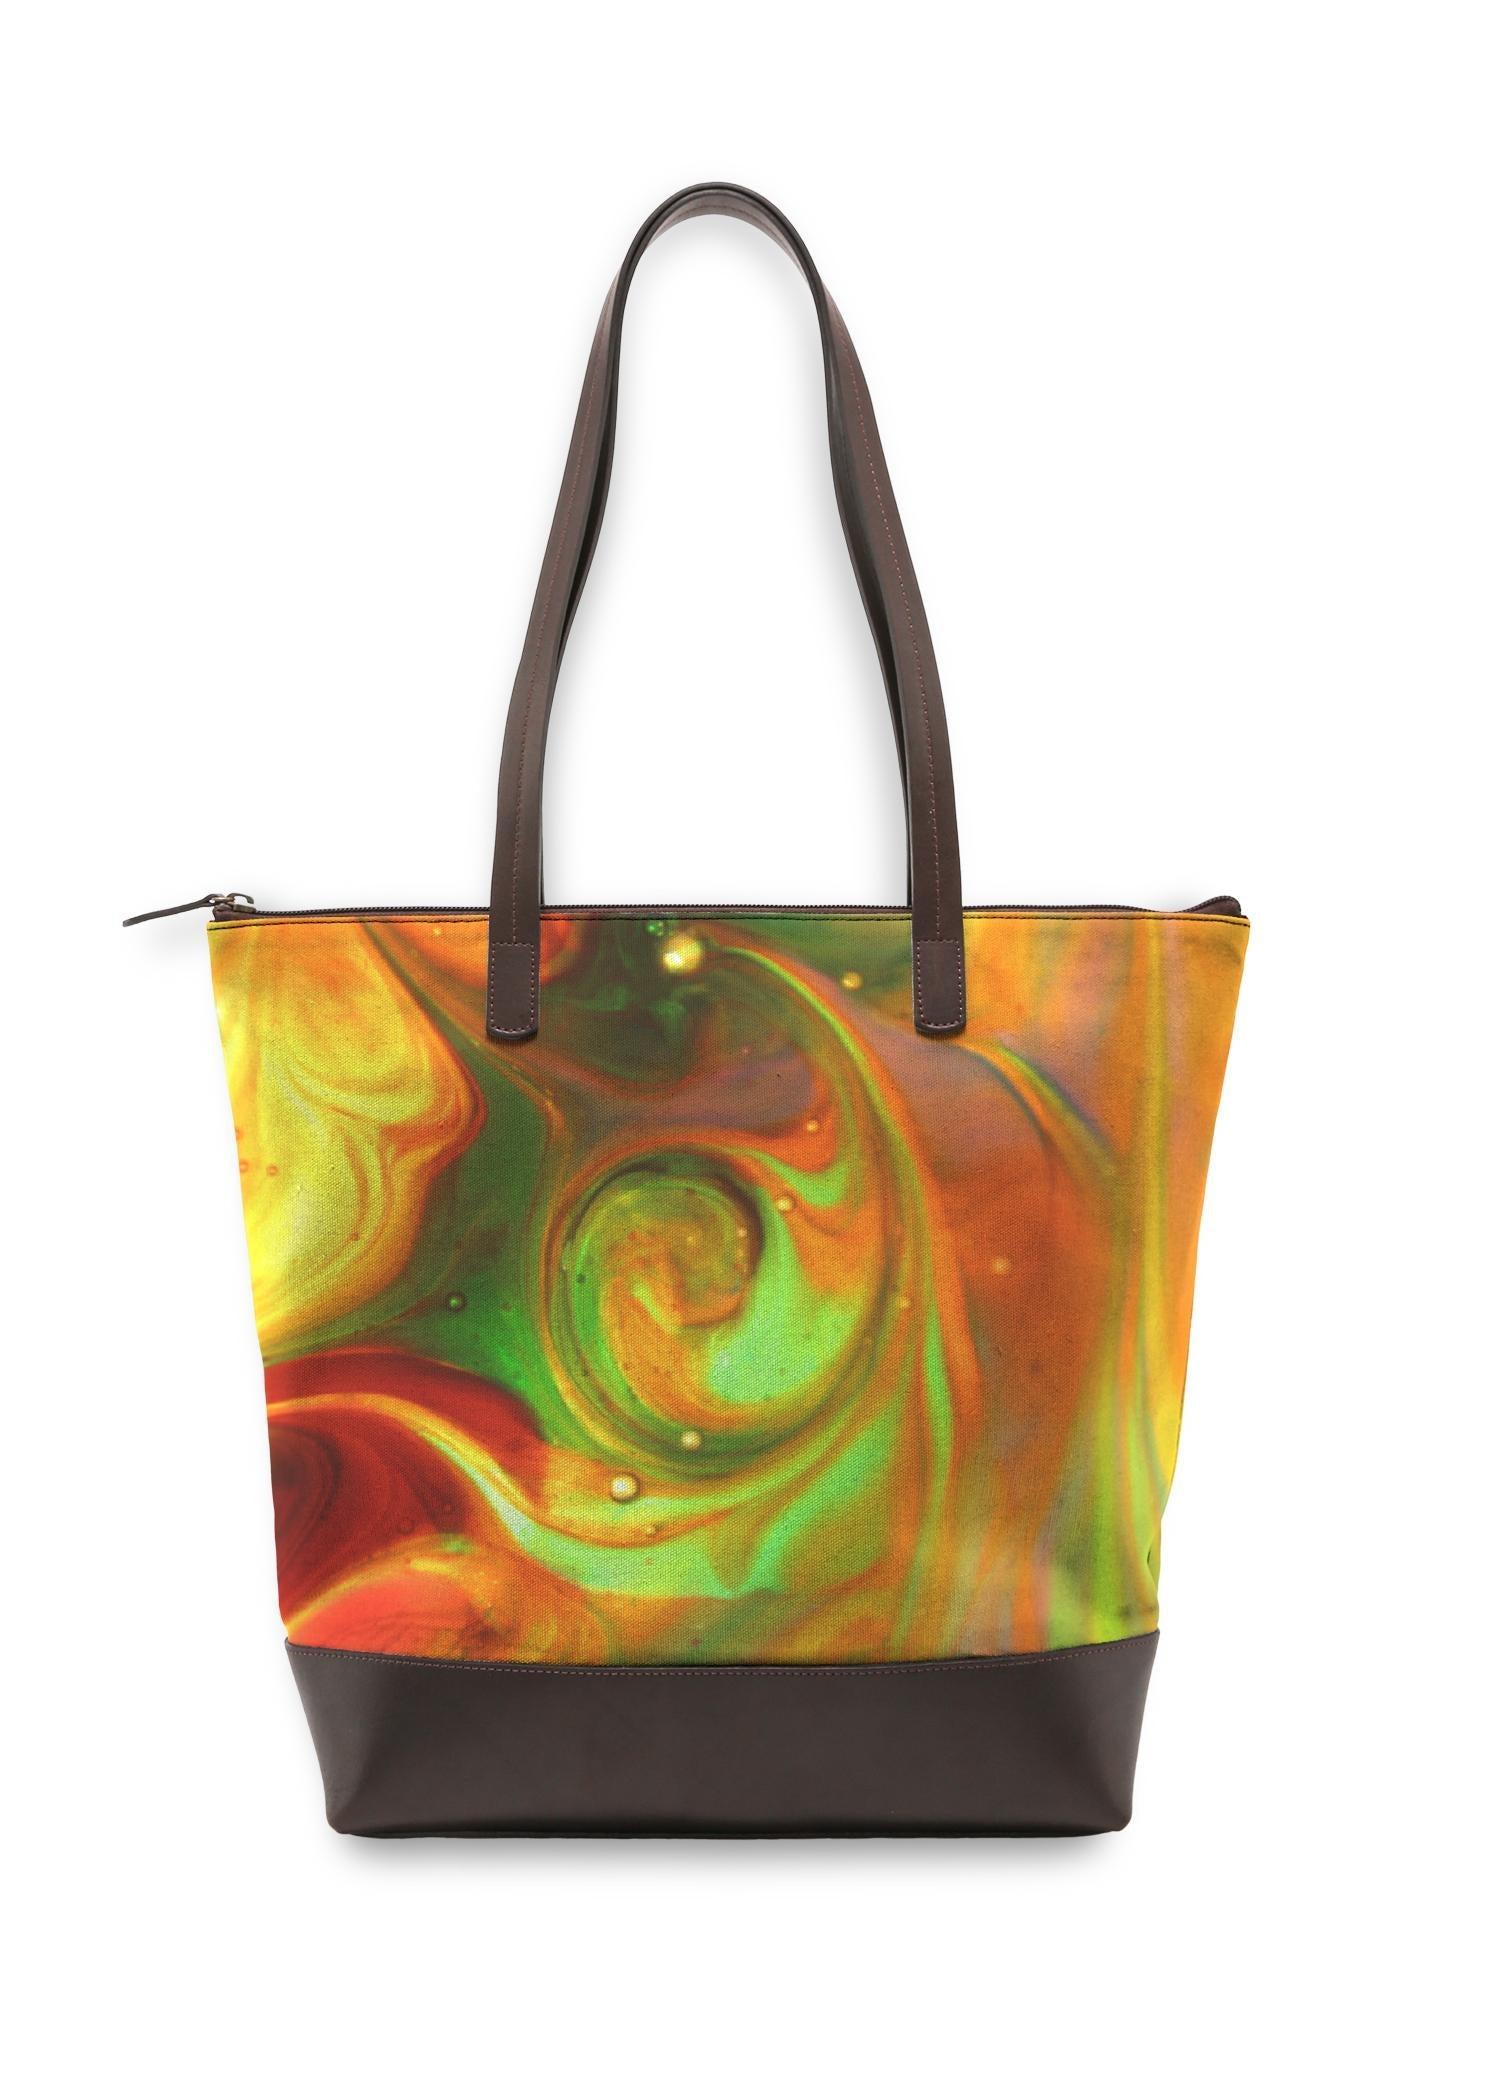 VIDA Statement Bag - Color Music by VIDA Original Artist  - Size: One Size